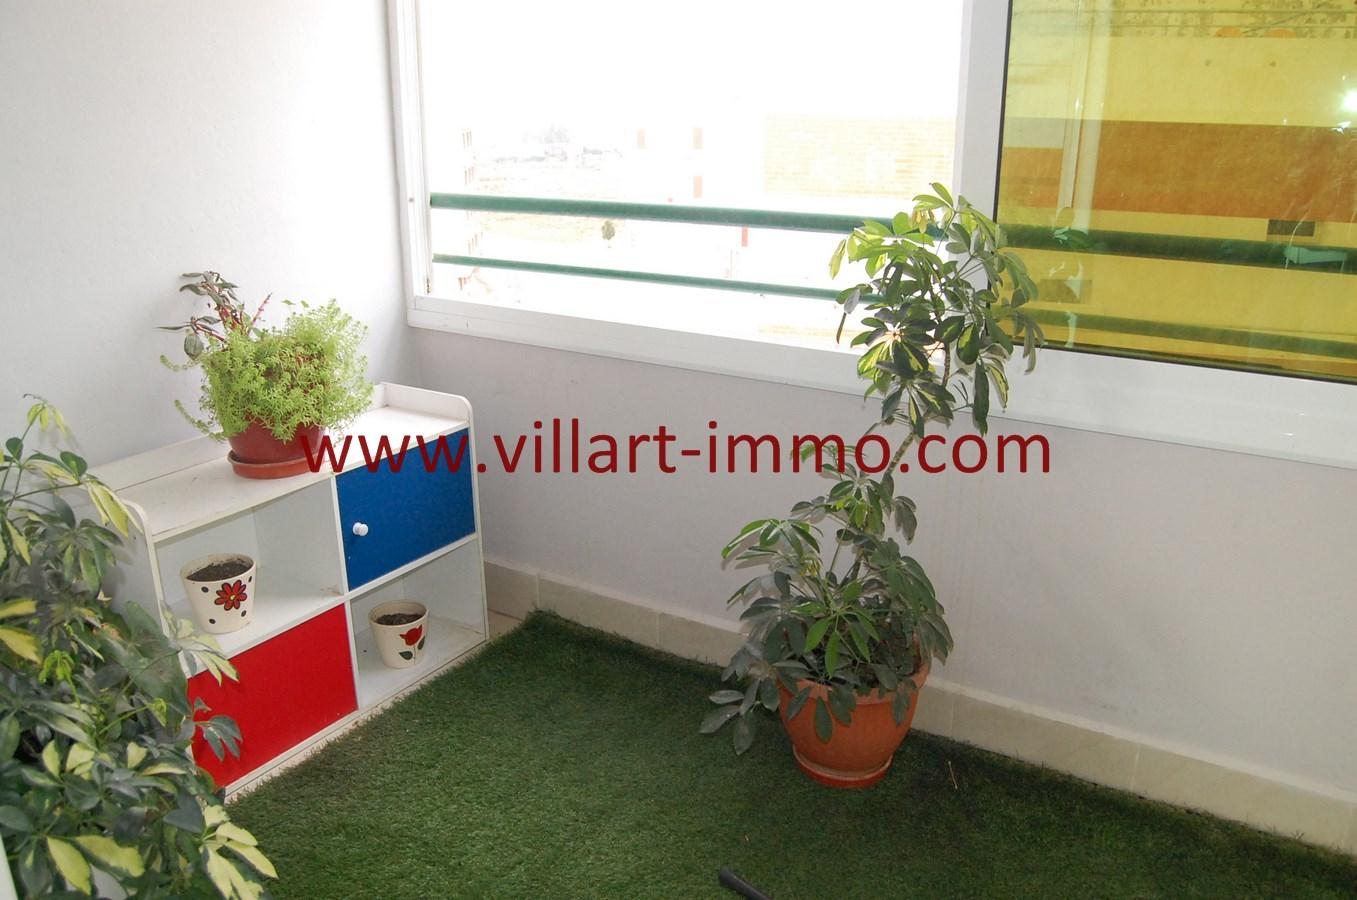 11-Vente-Appartement-Tanger-Terrasse 2-VA480-Villart Immo